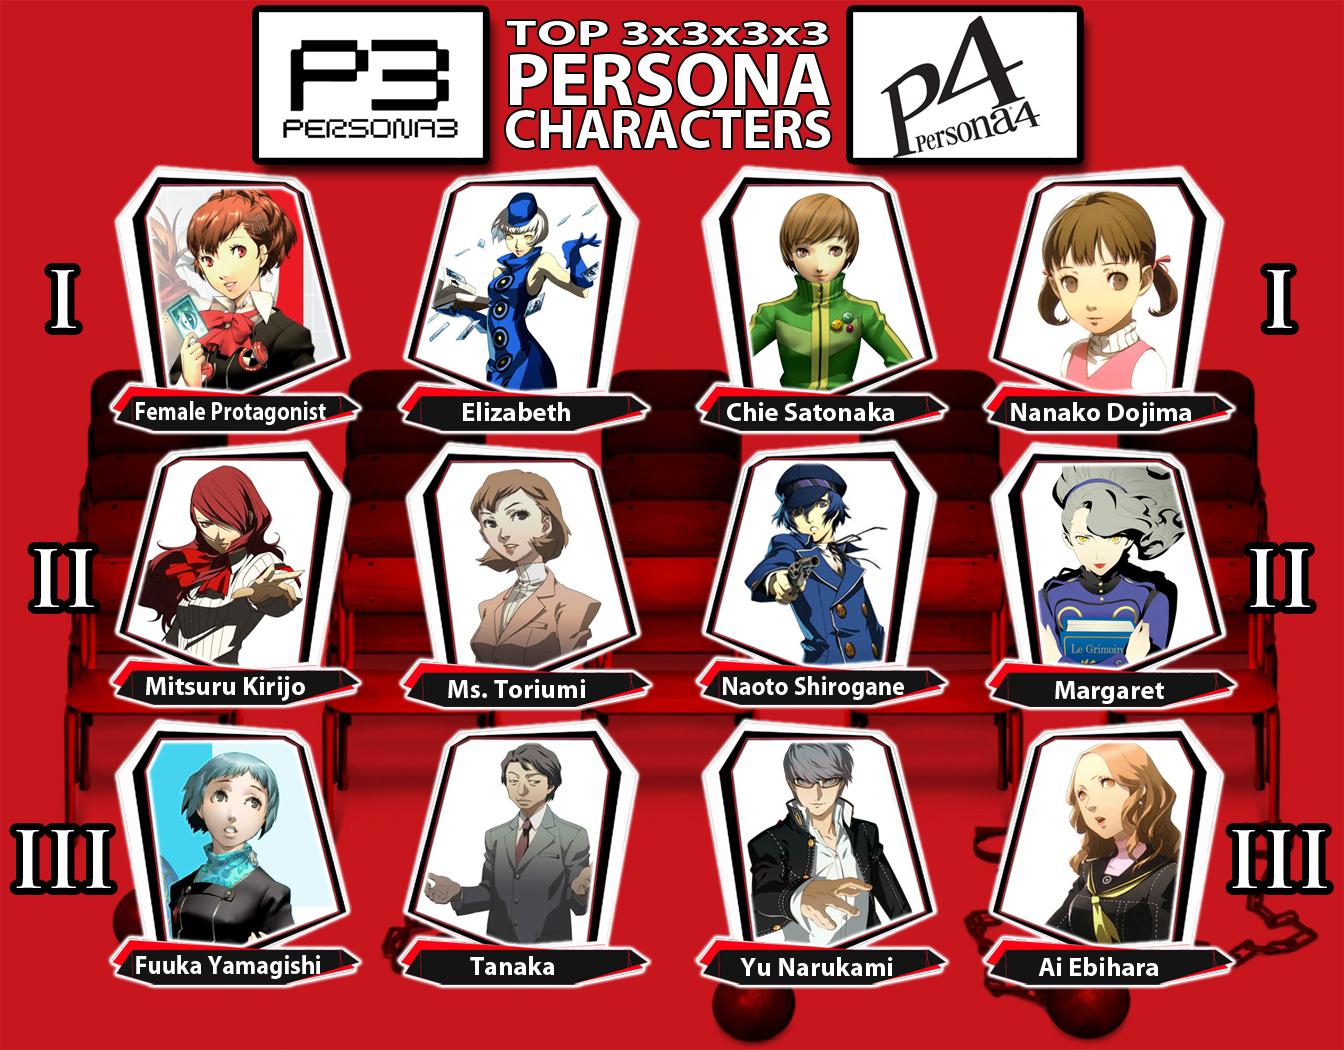 3 characters persona Persona 3: